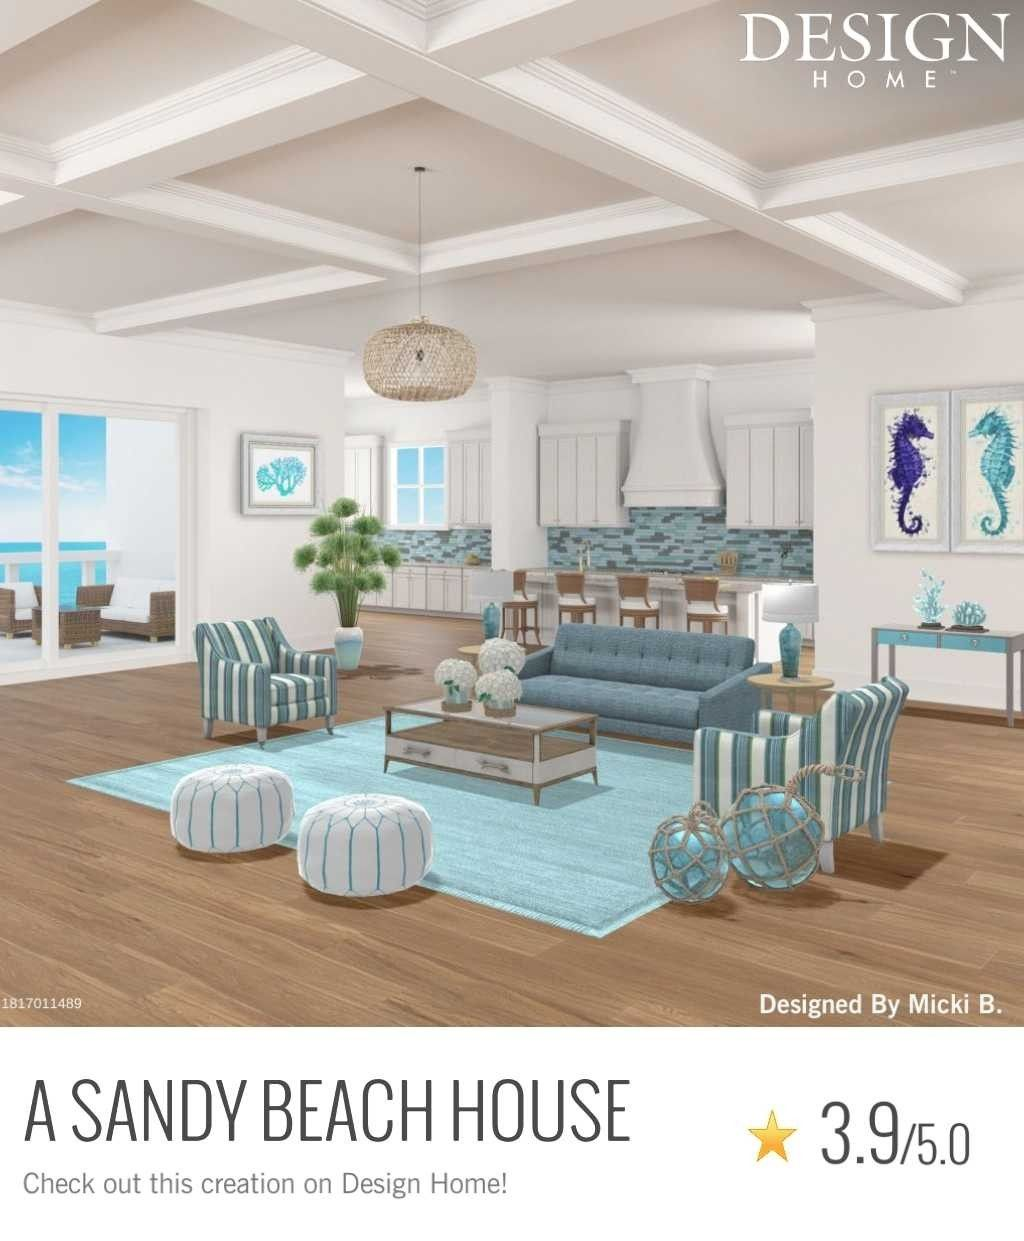 Pin By Michelle Britvec On Design Home App Design Home App House Design House Design Games